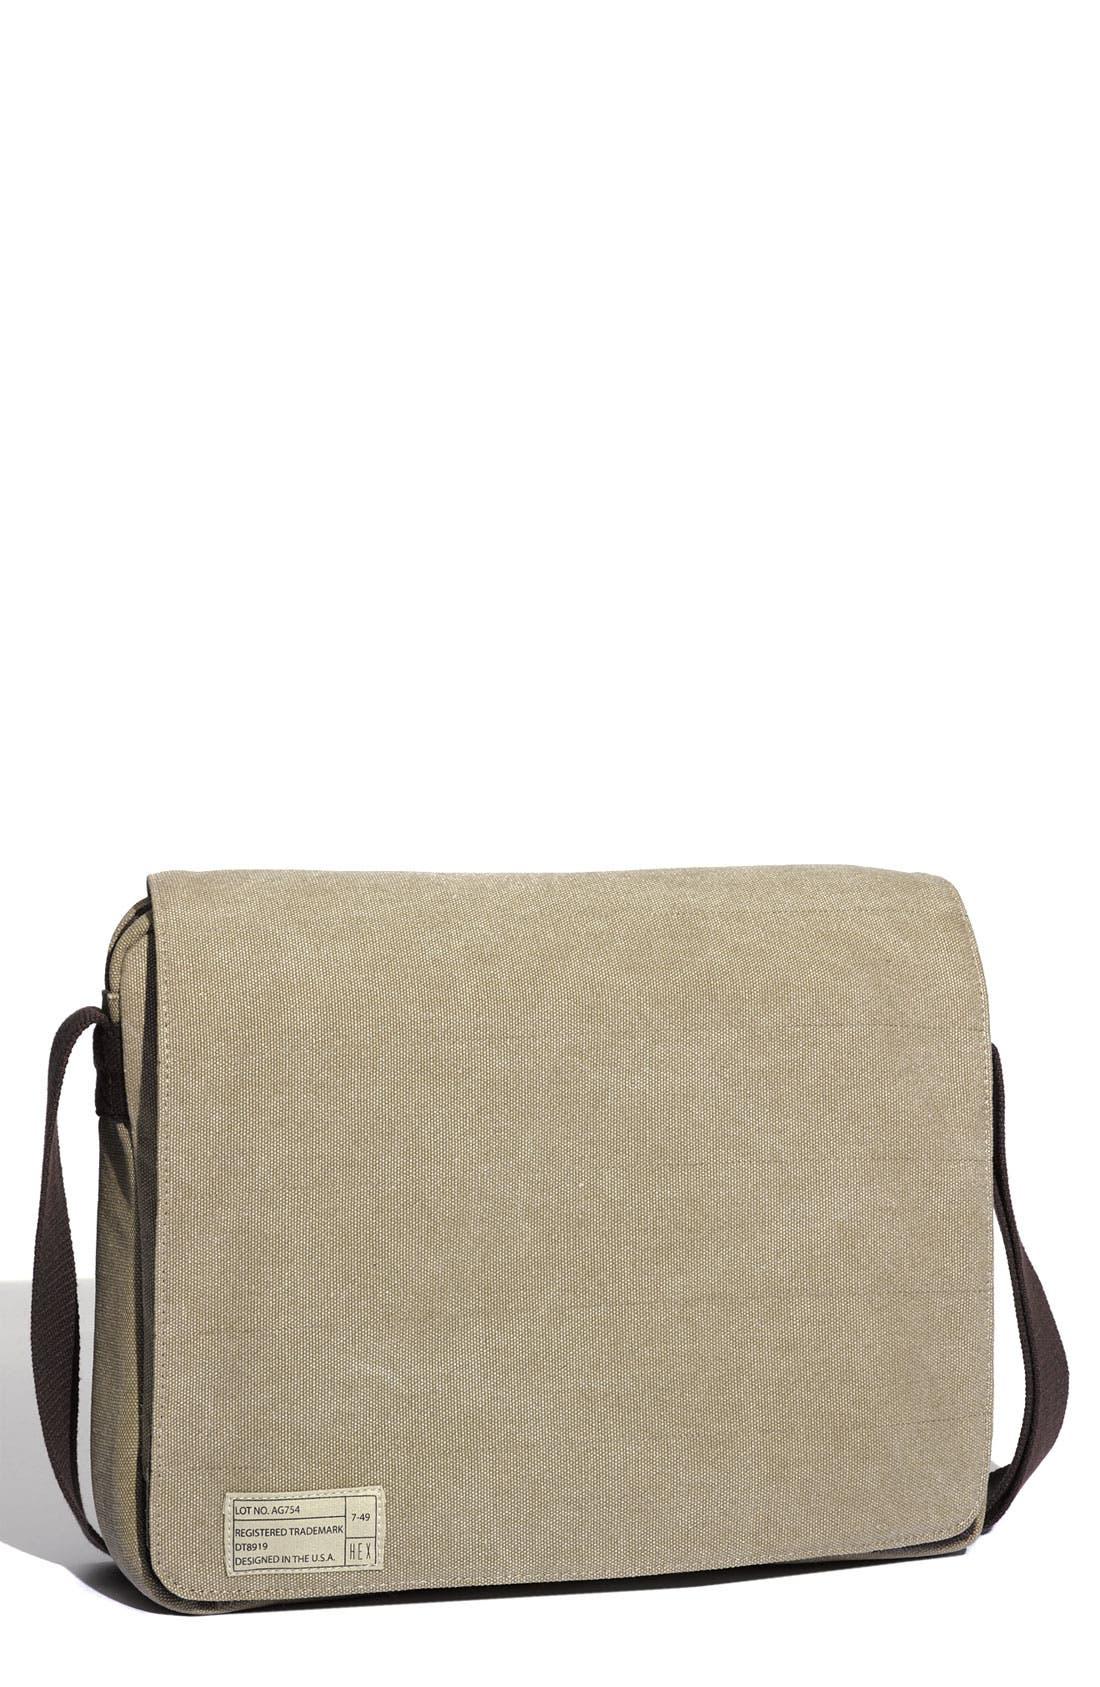 Alternate Image 1 Selected - HEX iPad Messenger Bag